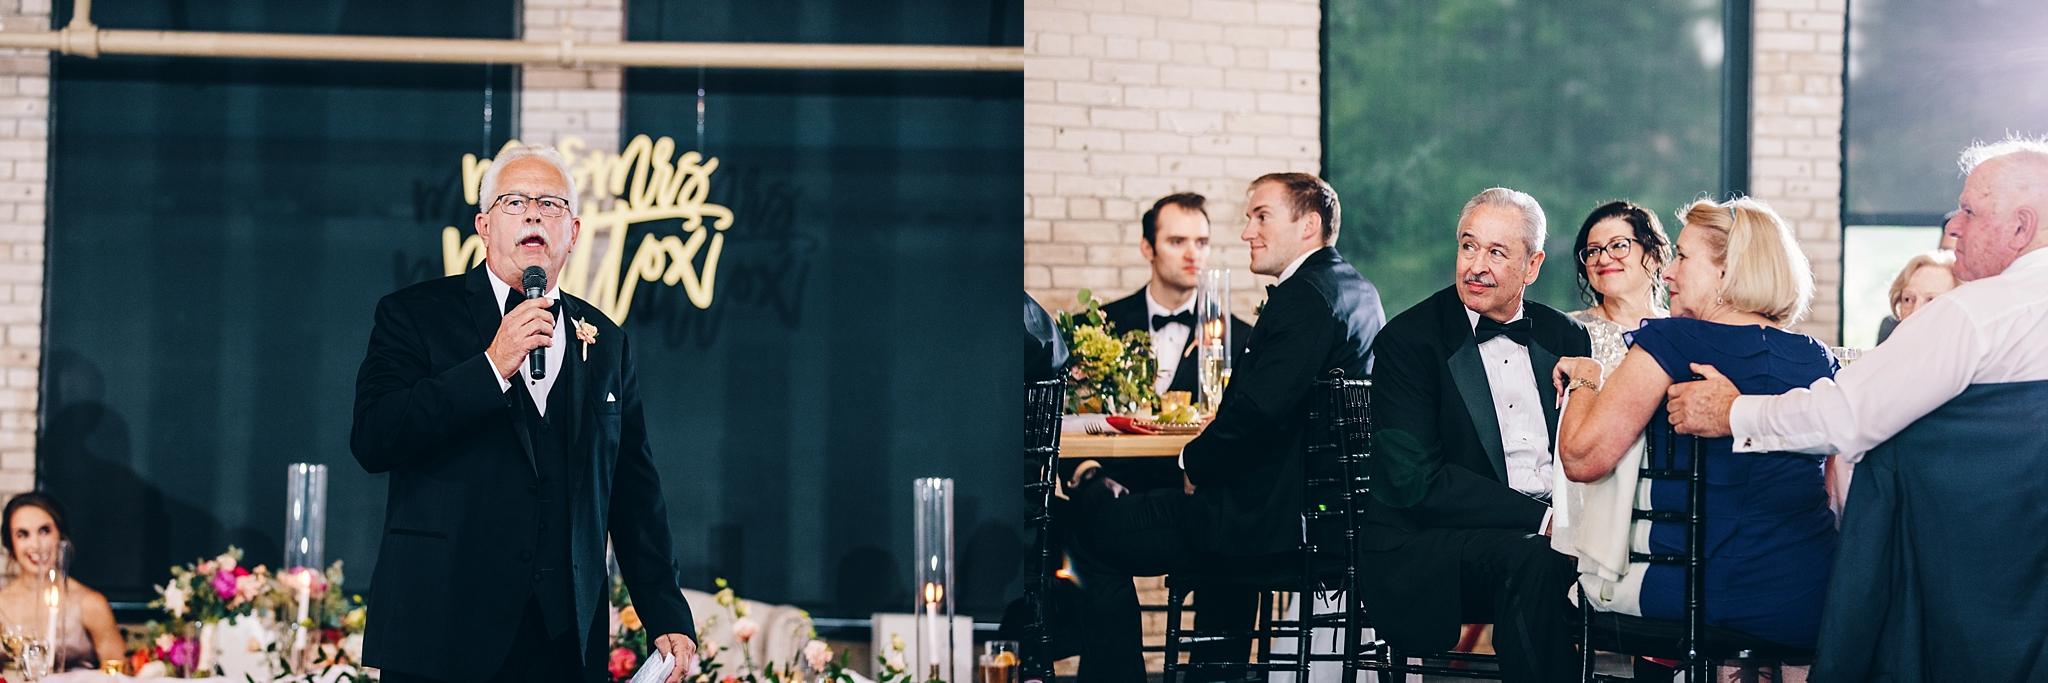 baker-lofts-holland-michigan-wedding-photographer_0388.jpg